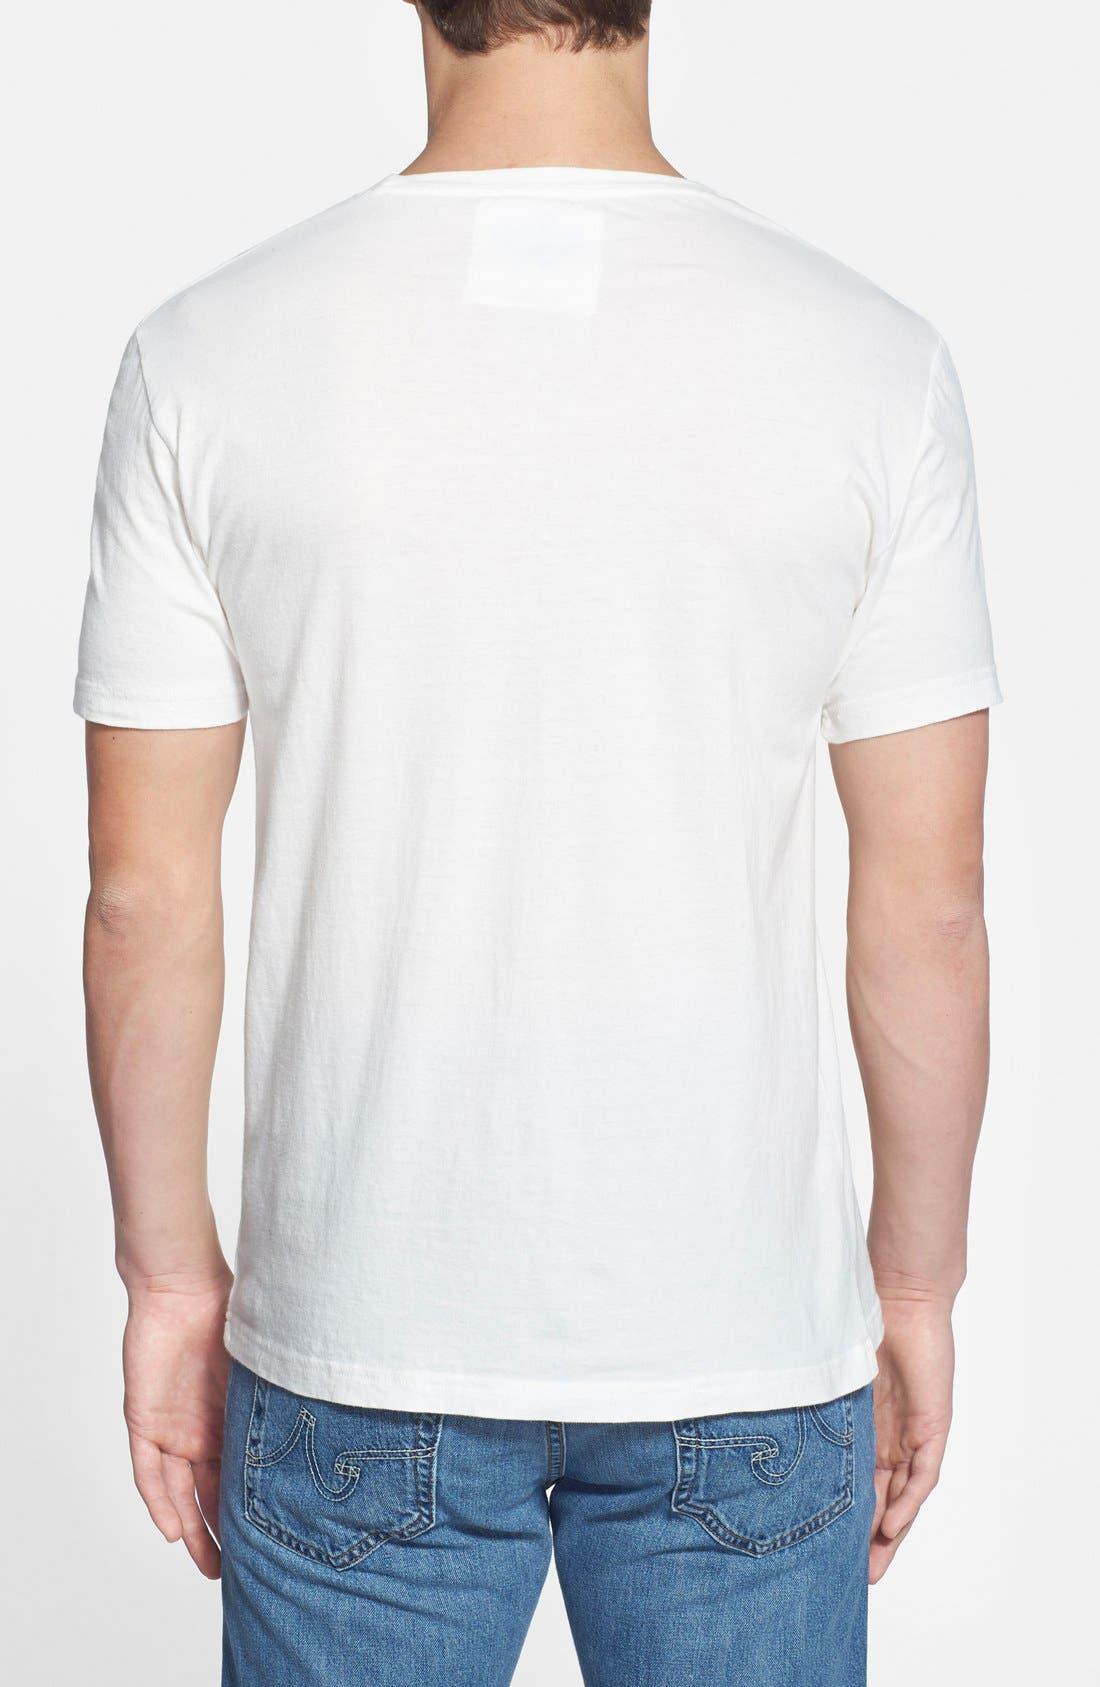 'Houston Astros - Brass Tacks' T-Shirt,                             Alternate thumbnail 3, color,                             139